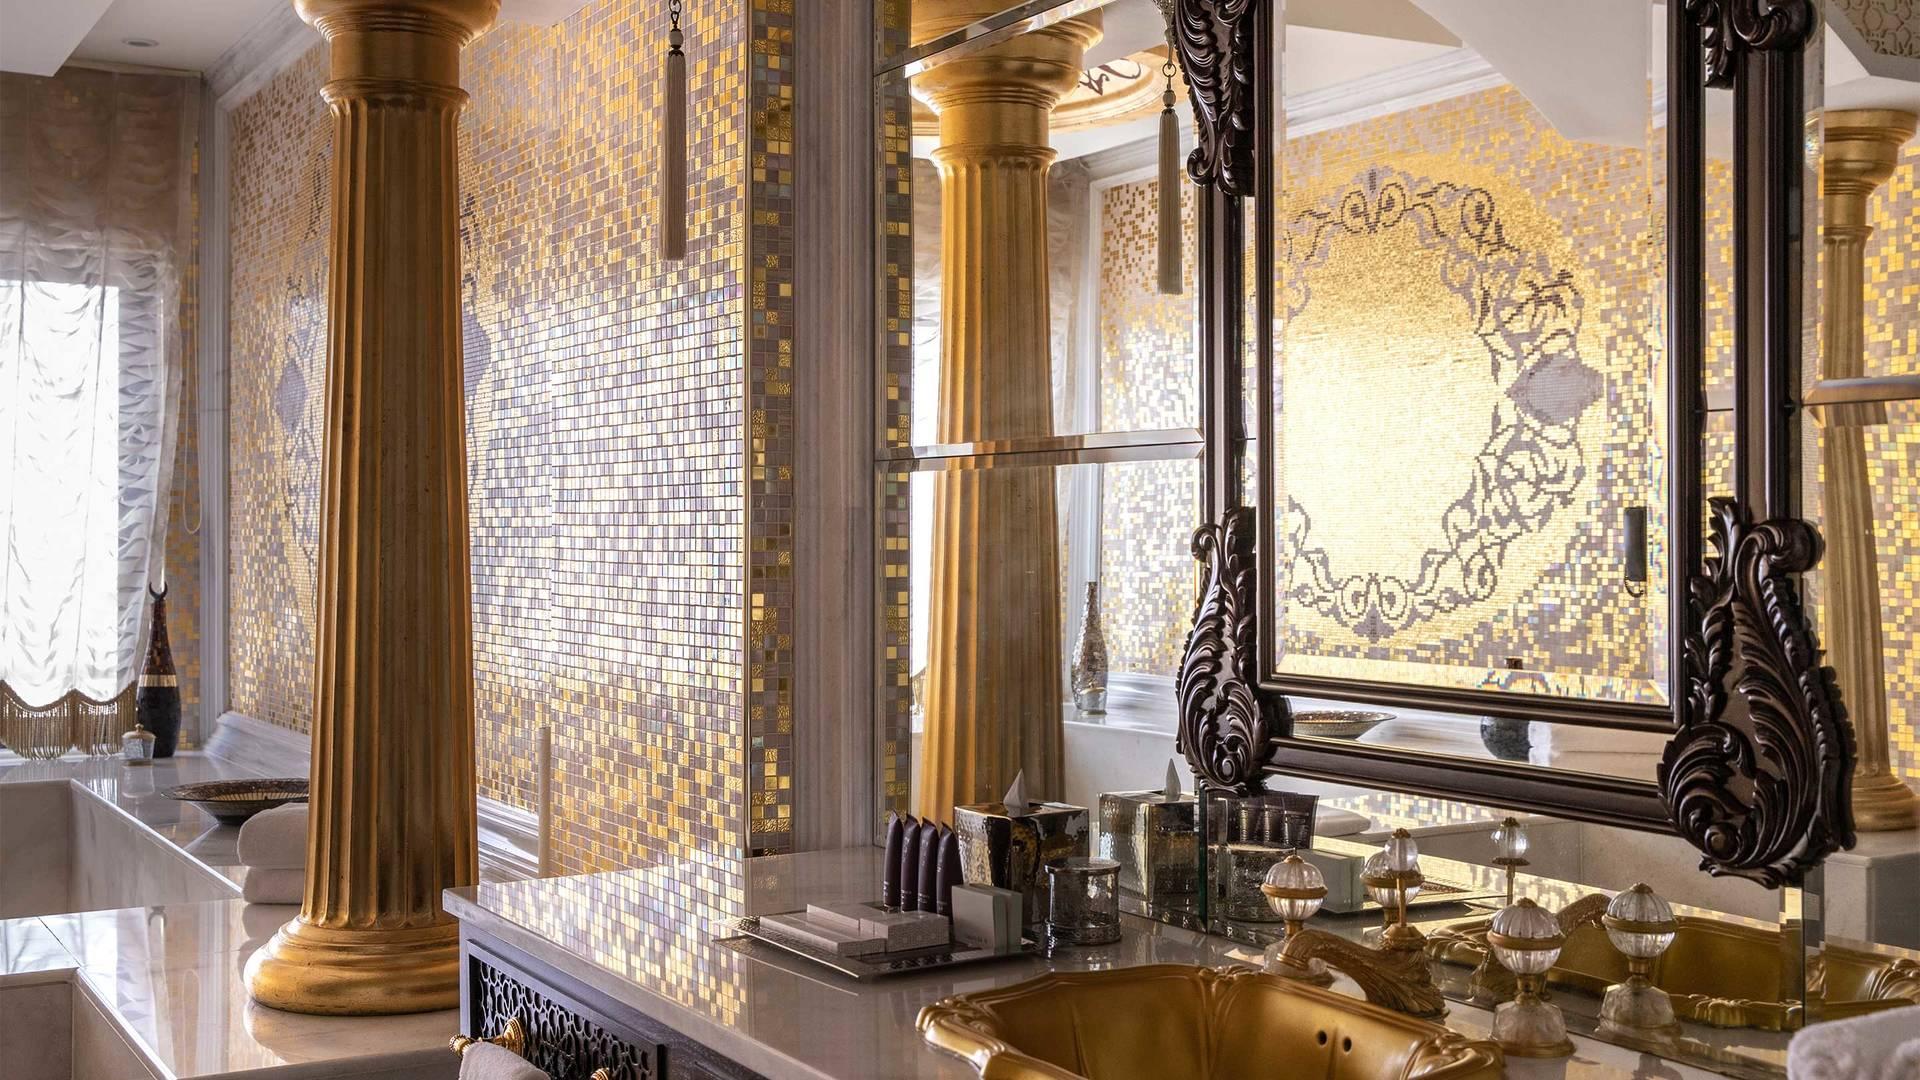 16-9_Jumeirah-Zabeel-Saray---Grand-Imperial-Suite---Bathroom-Area-Detailed